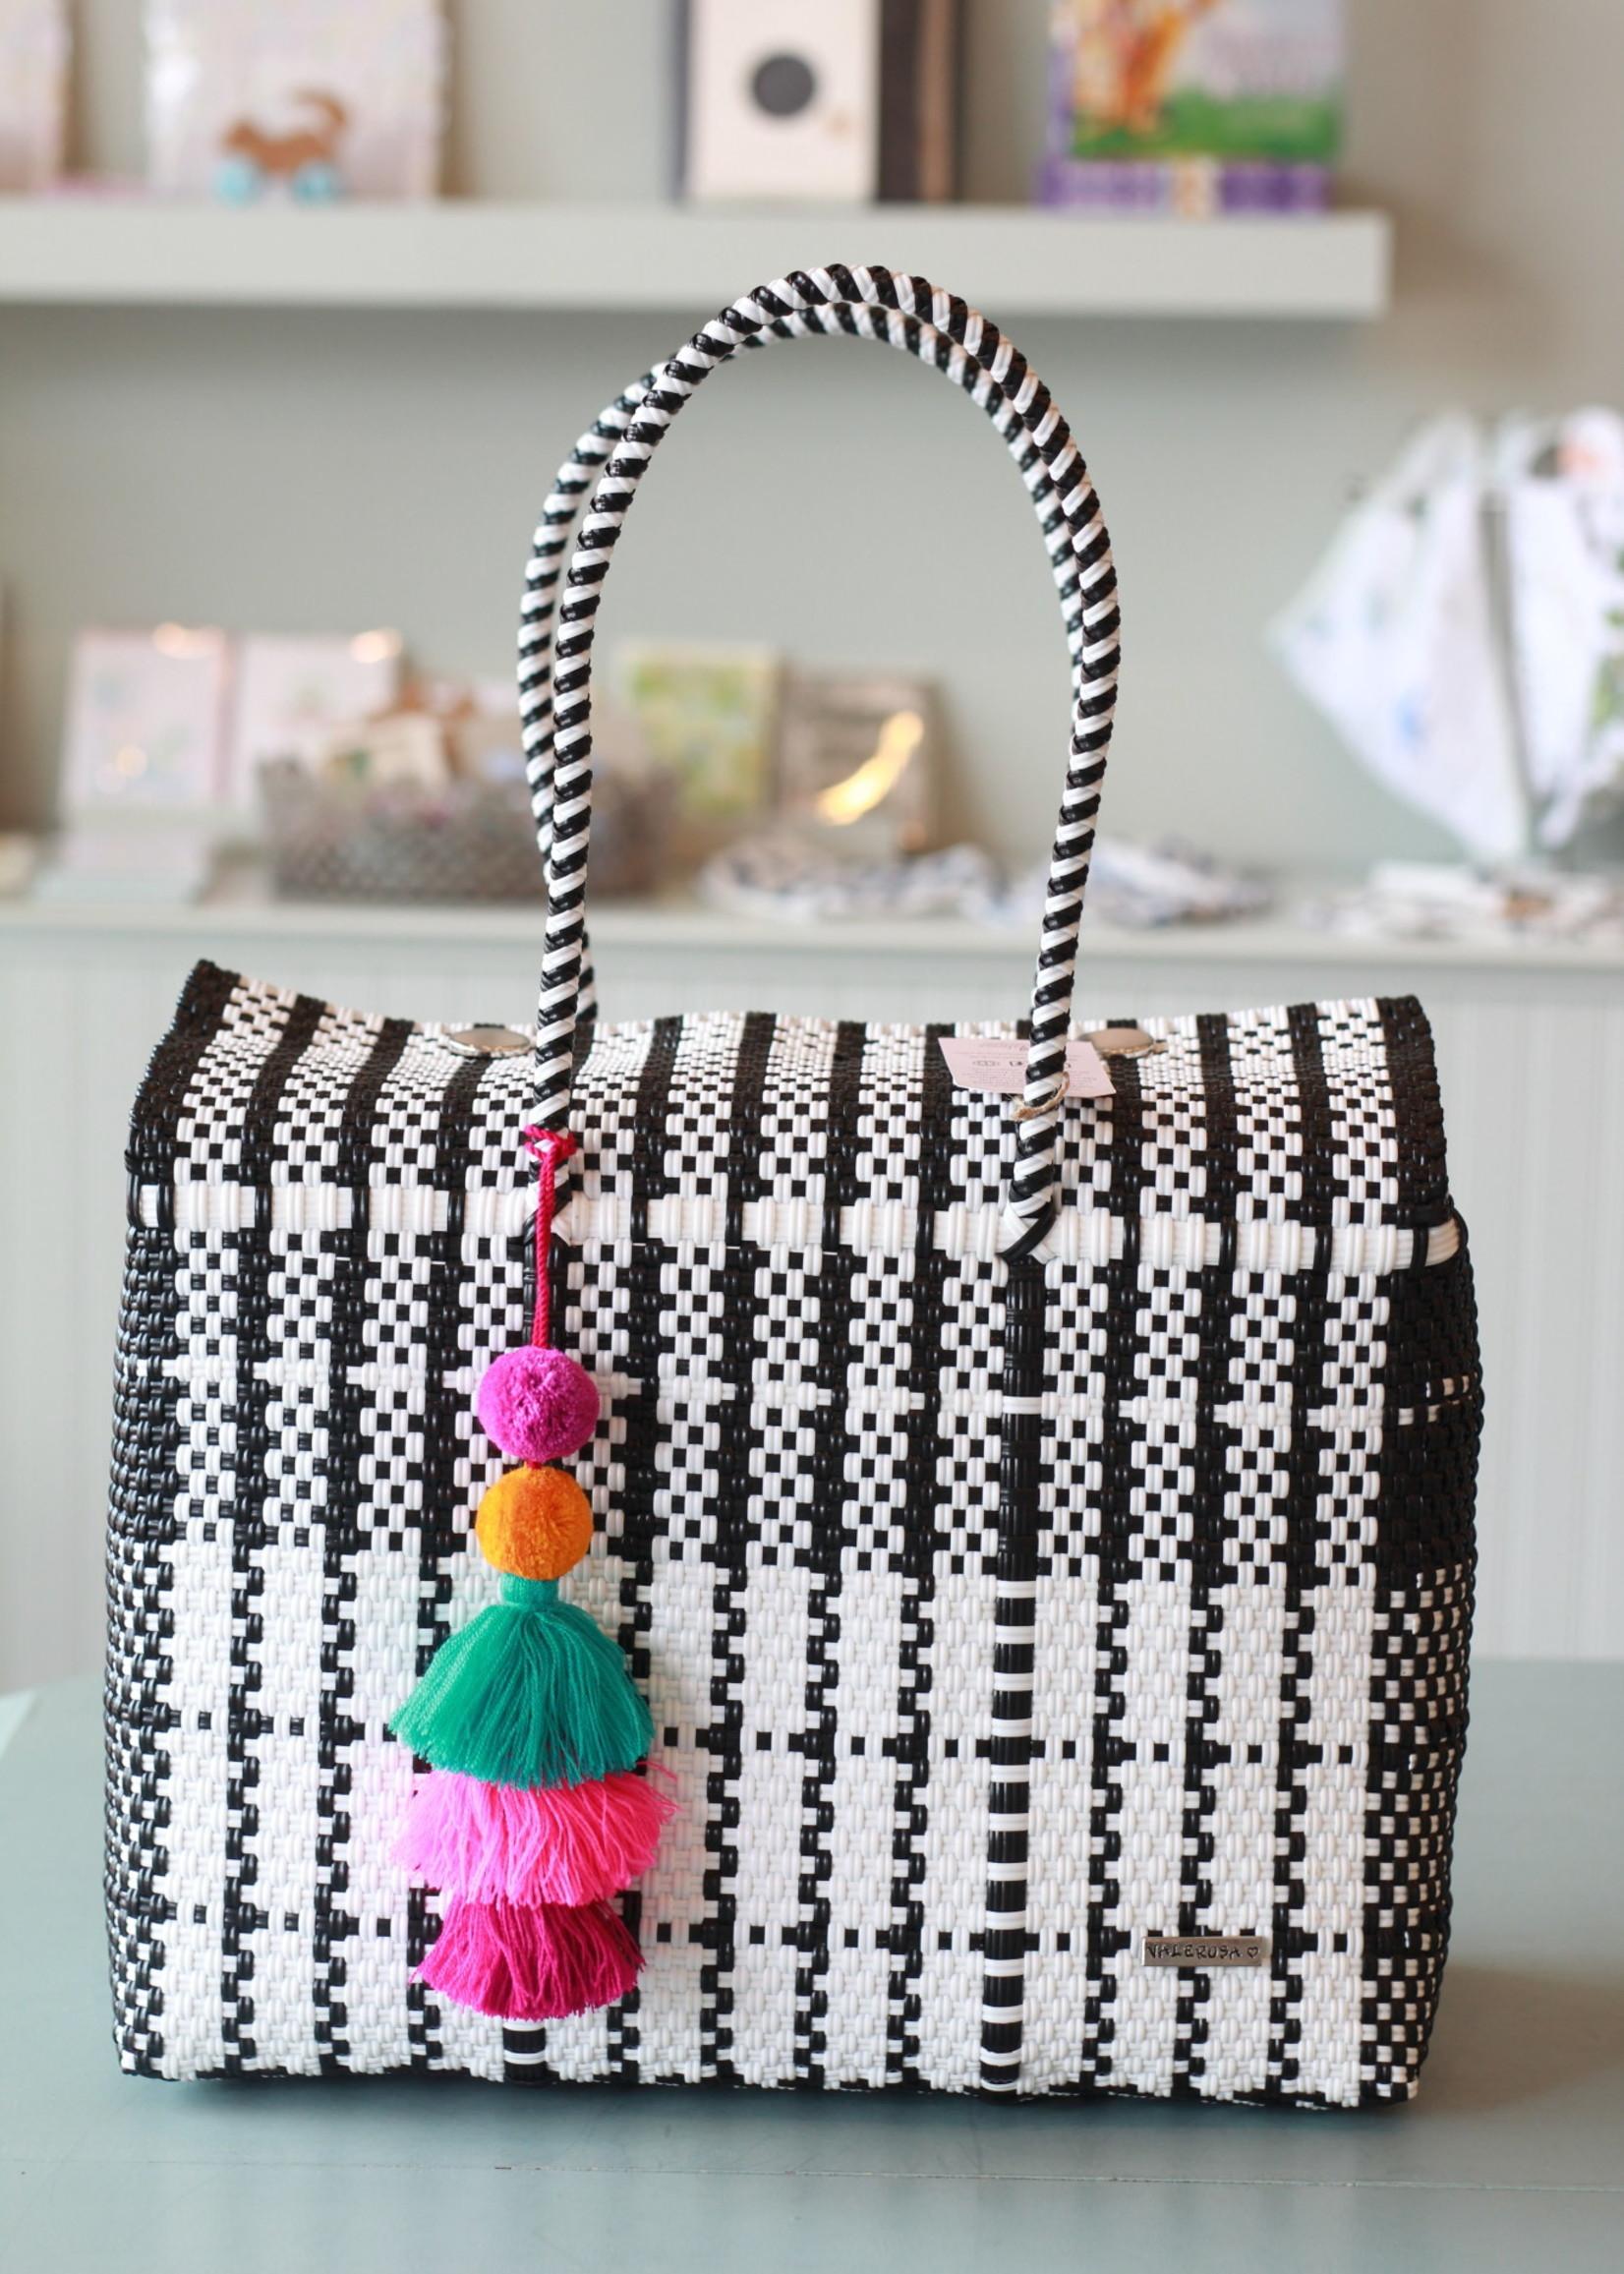 Valerosa Boutique Valerosa Black & White Dia Duffle With Colorful Tassel